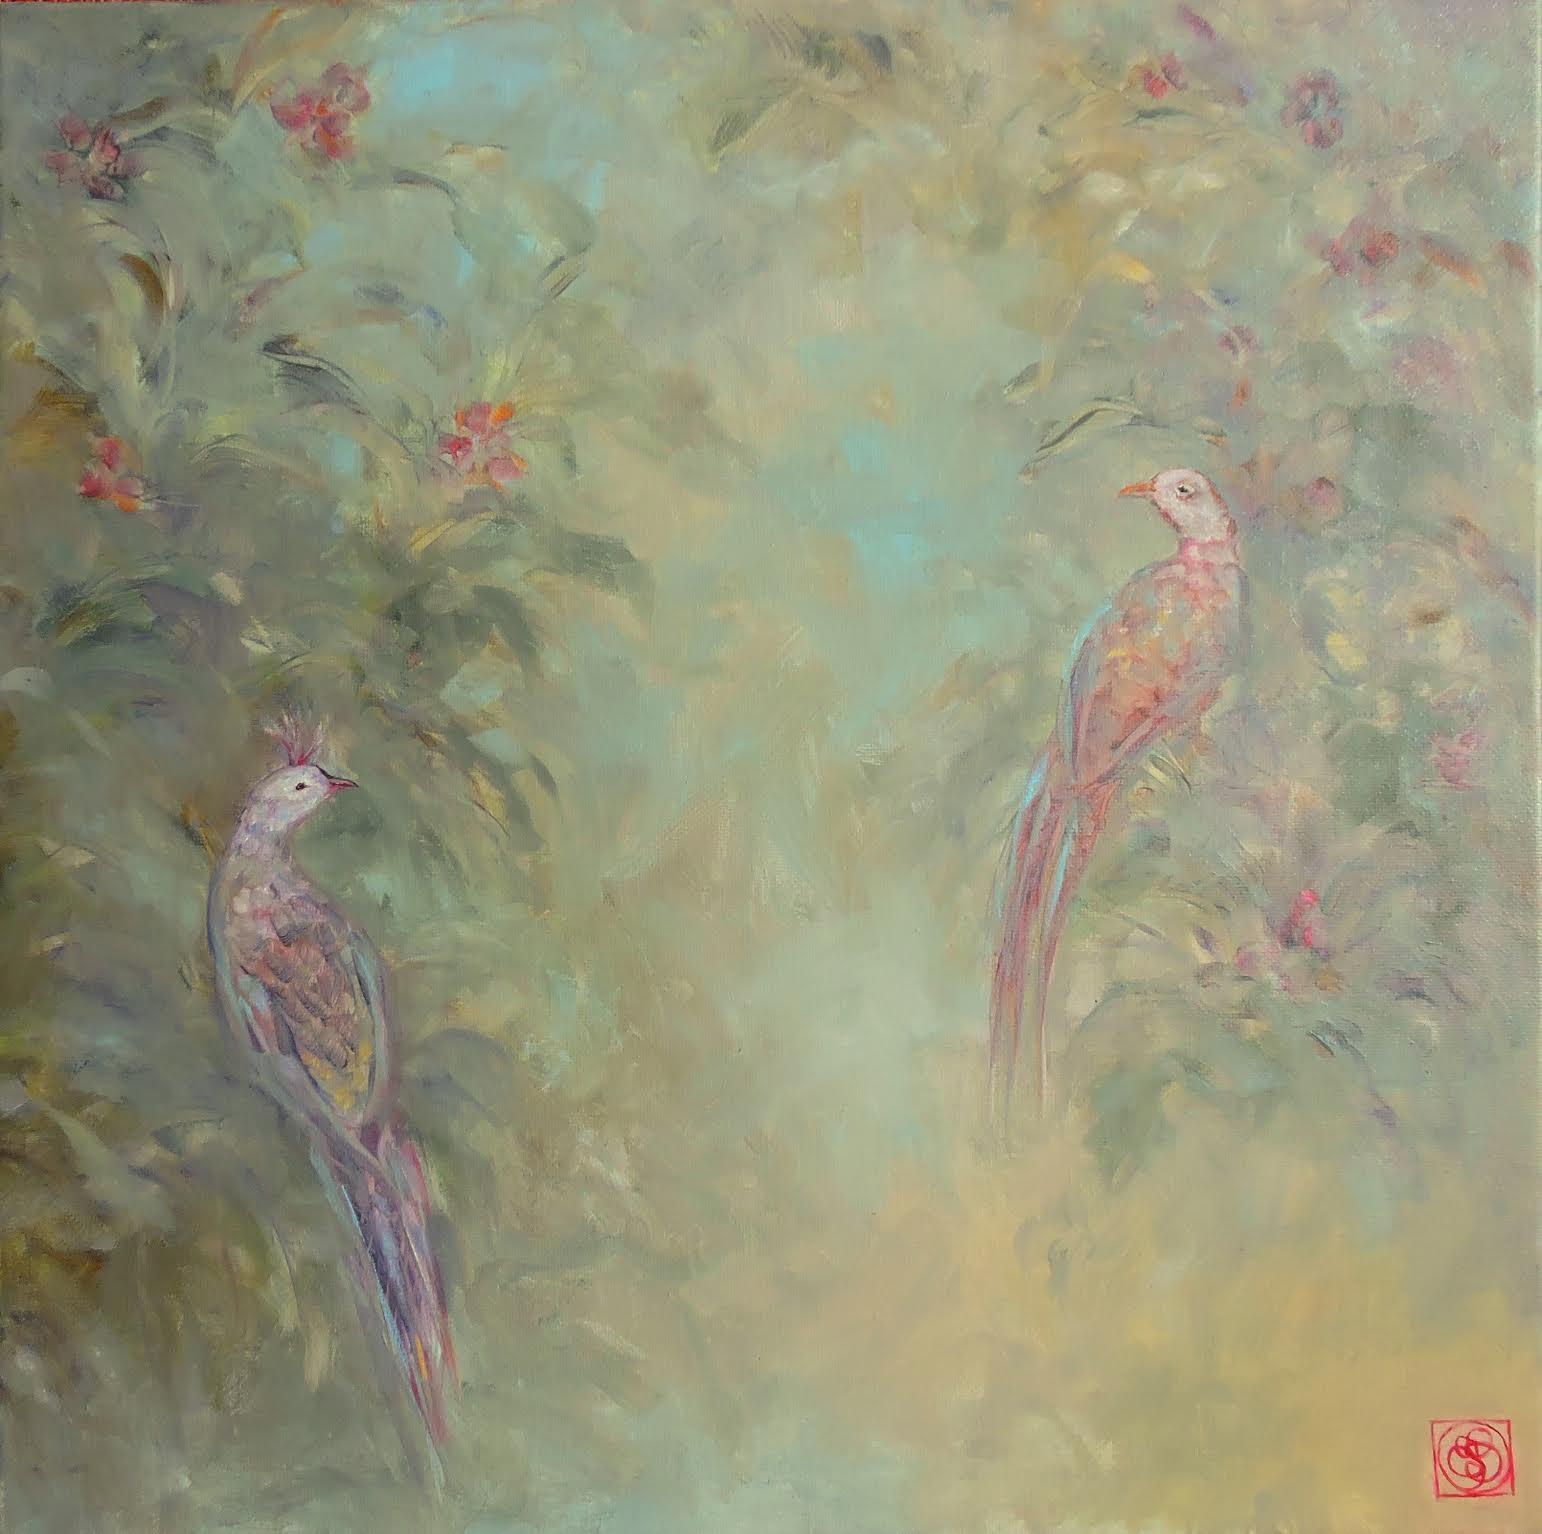 Birds of Sirius by Katia Bellini